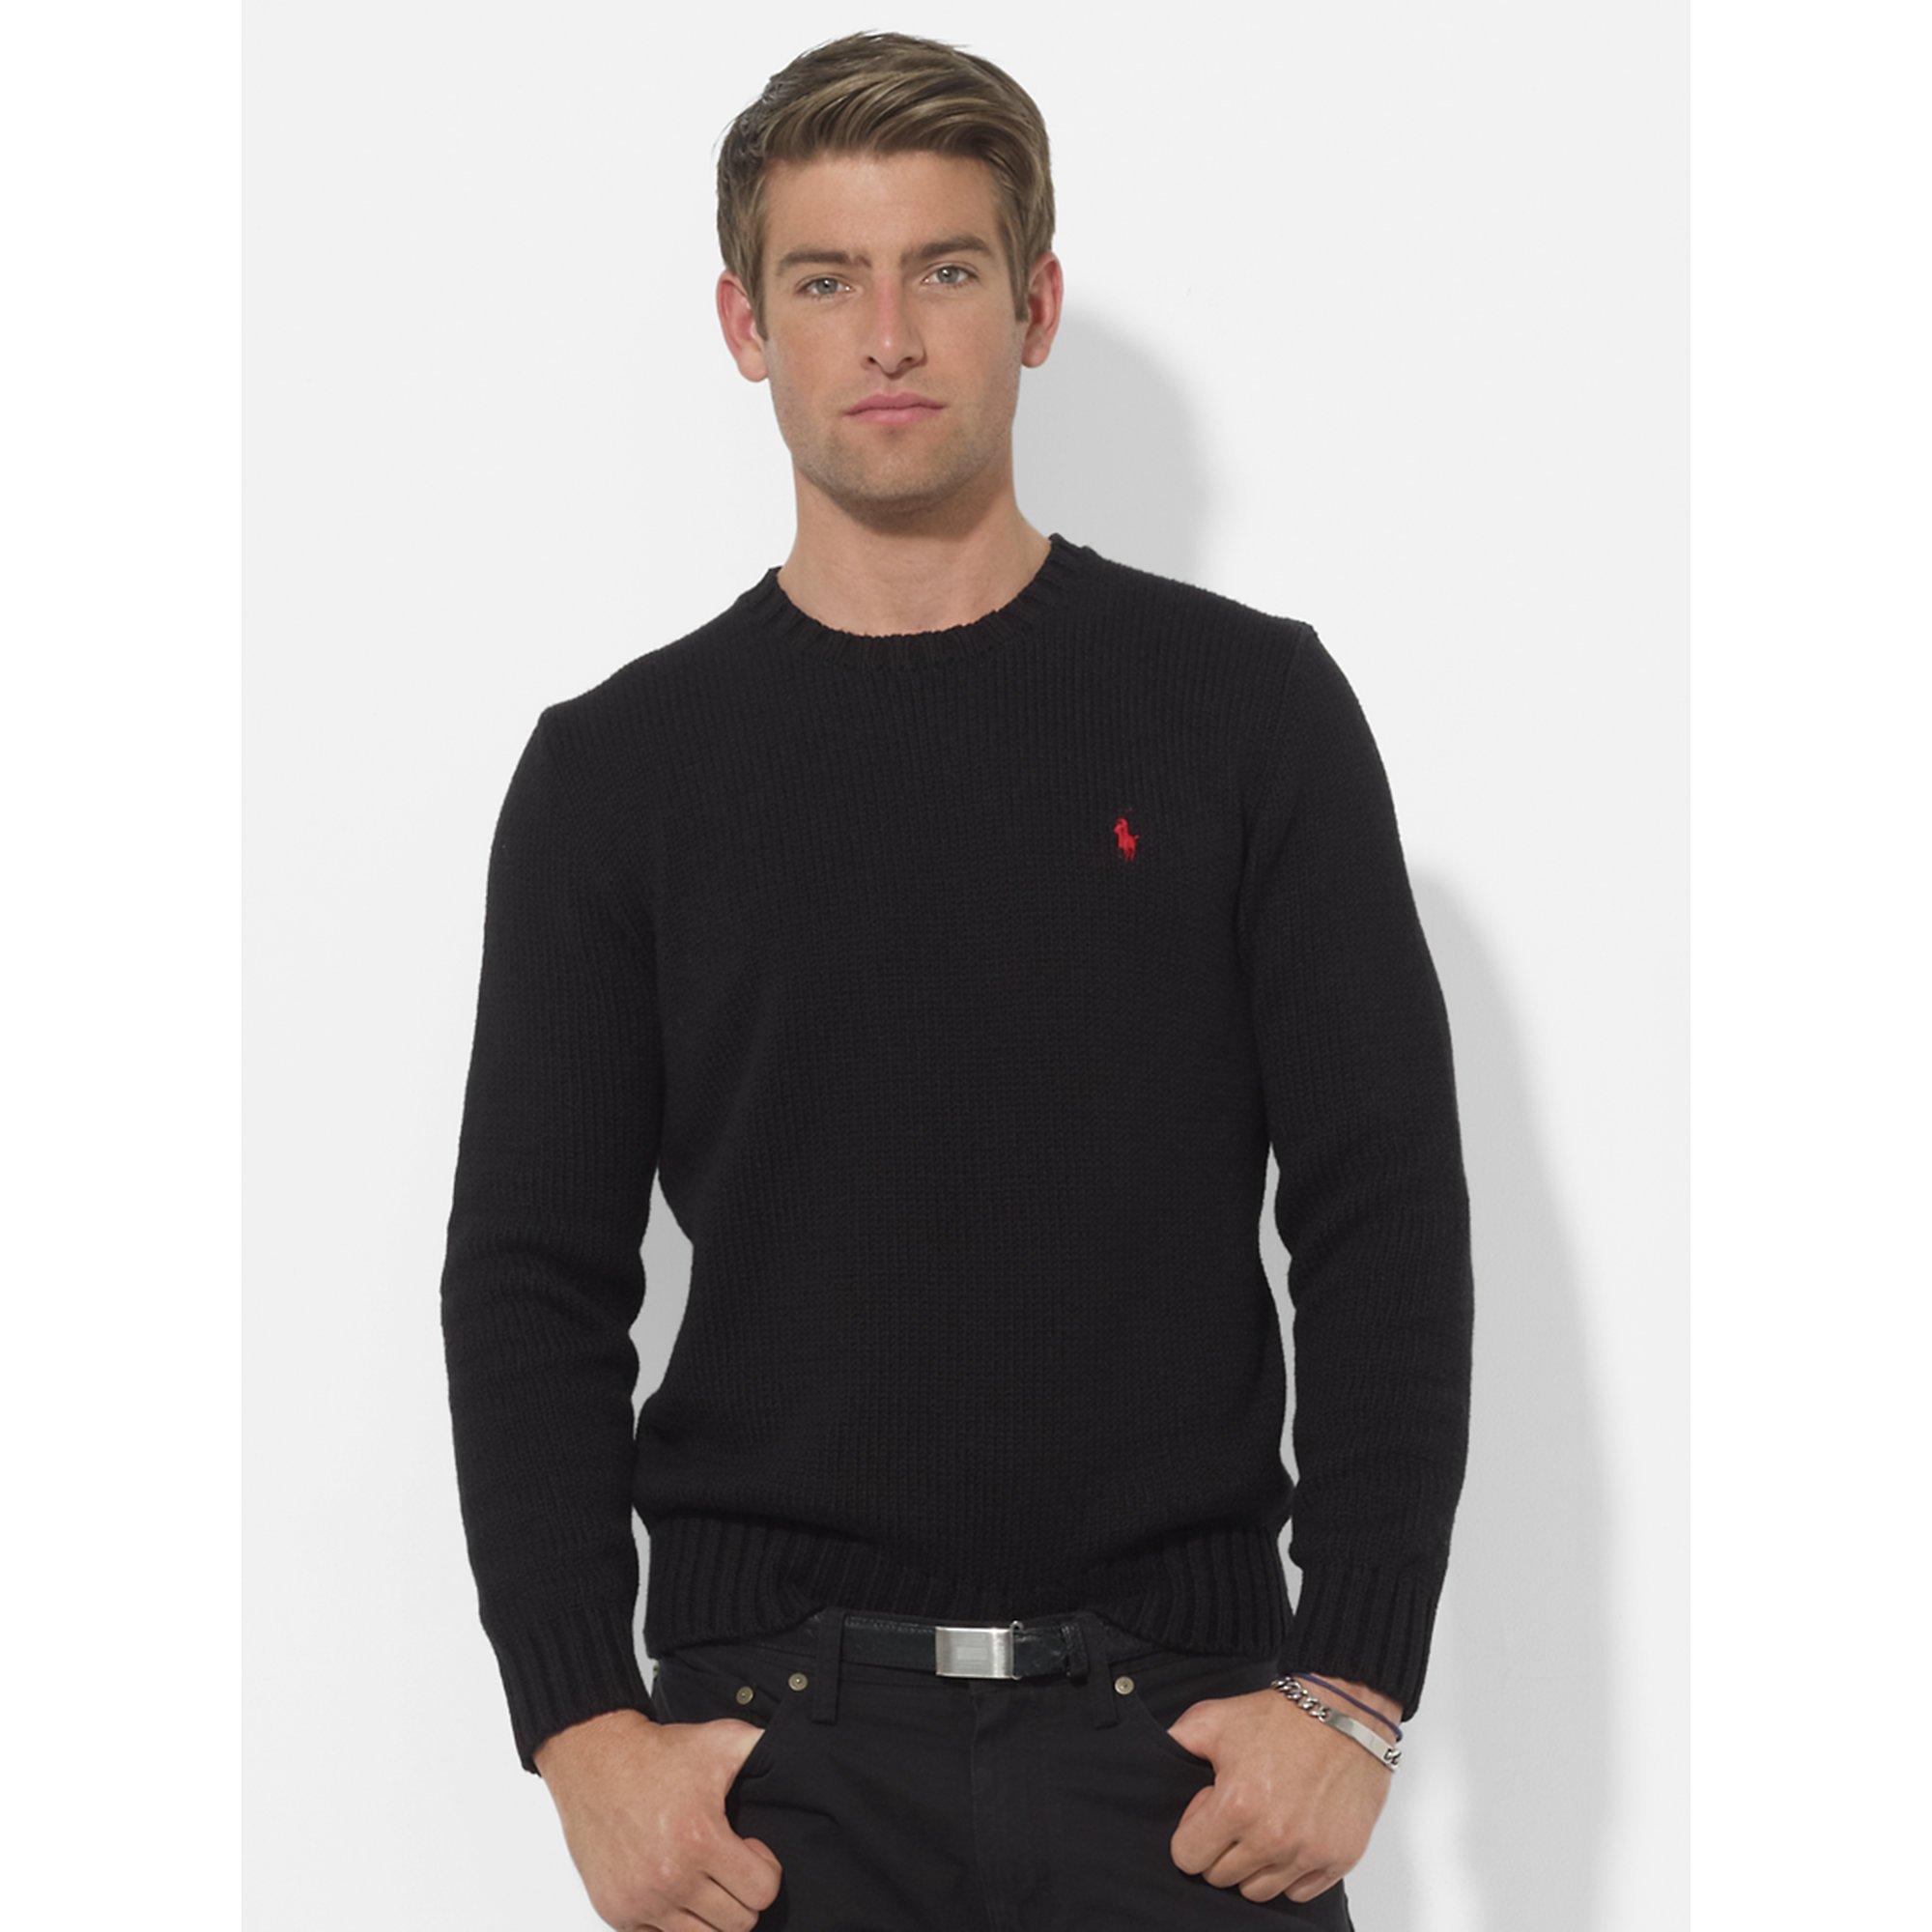 82927669128d8 Lyst - Polo Ralph Lauren Cotton Crewneck Sweater in Black for Men